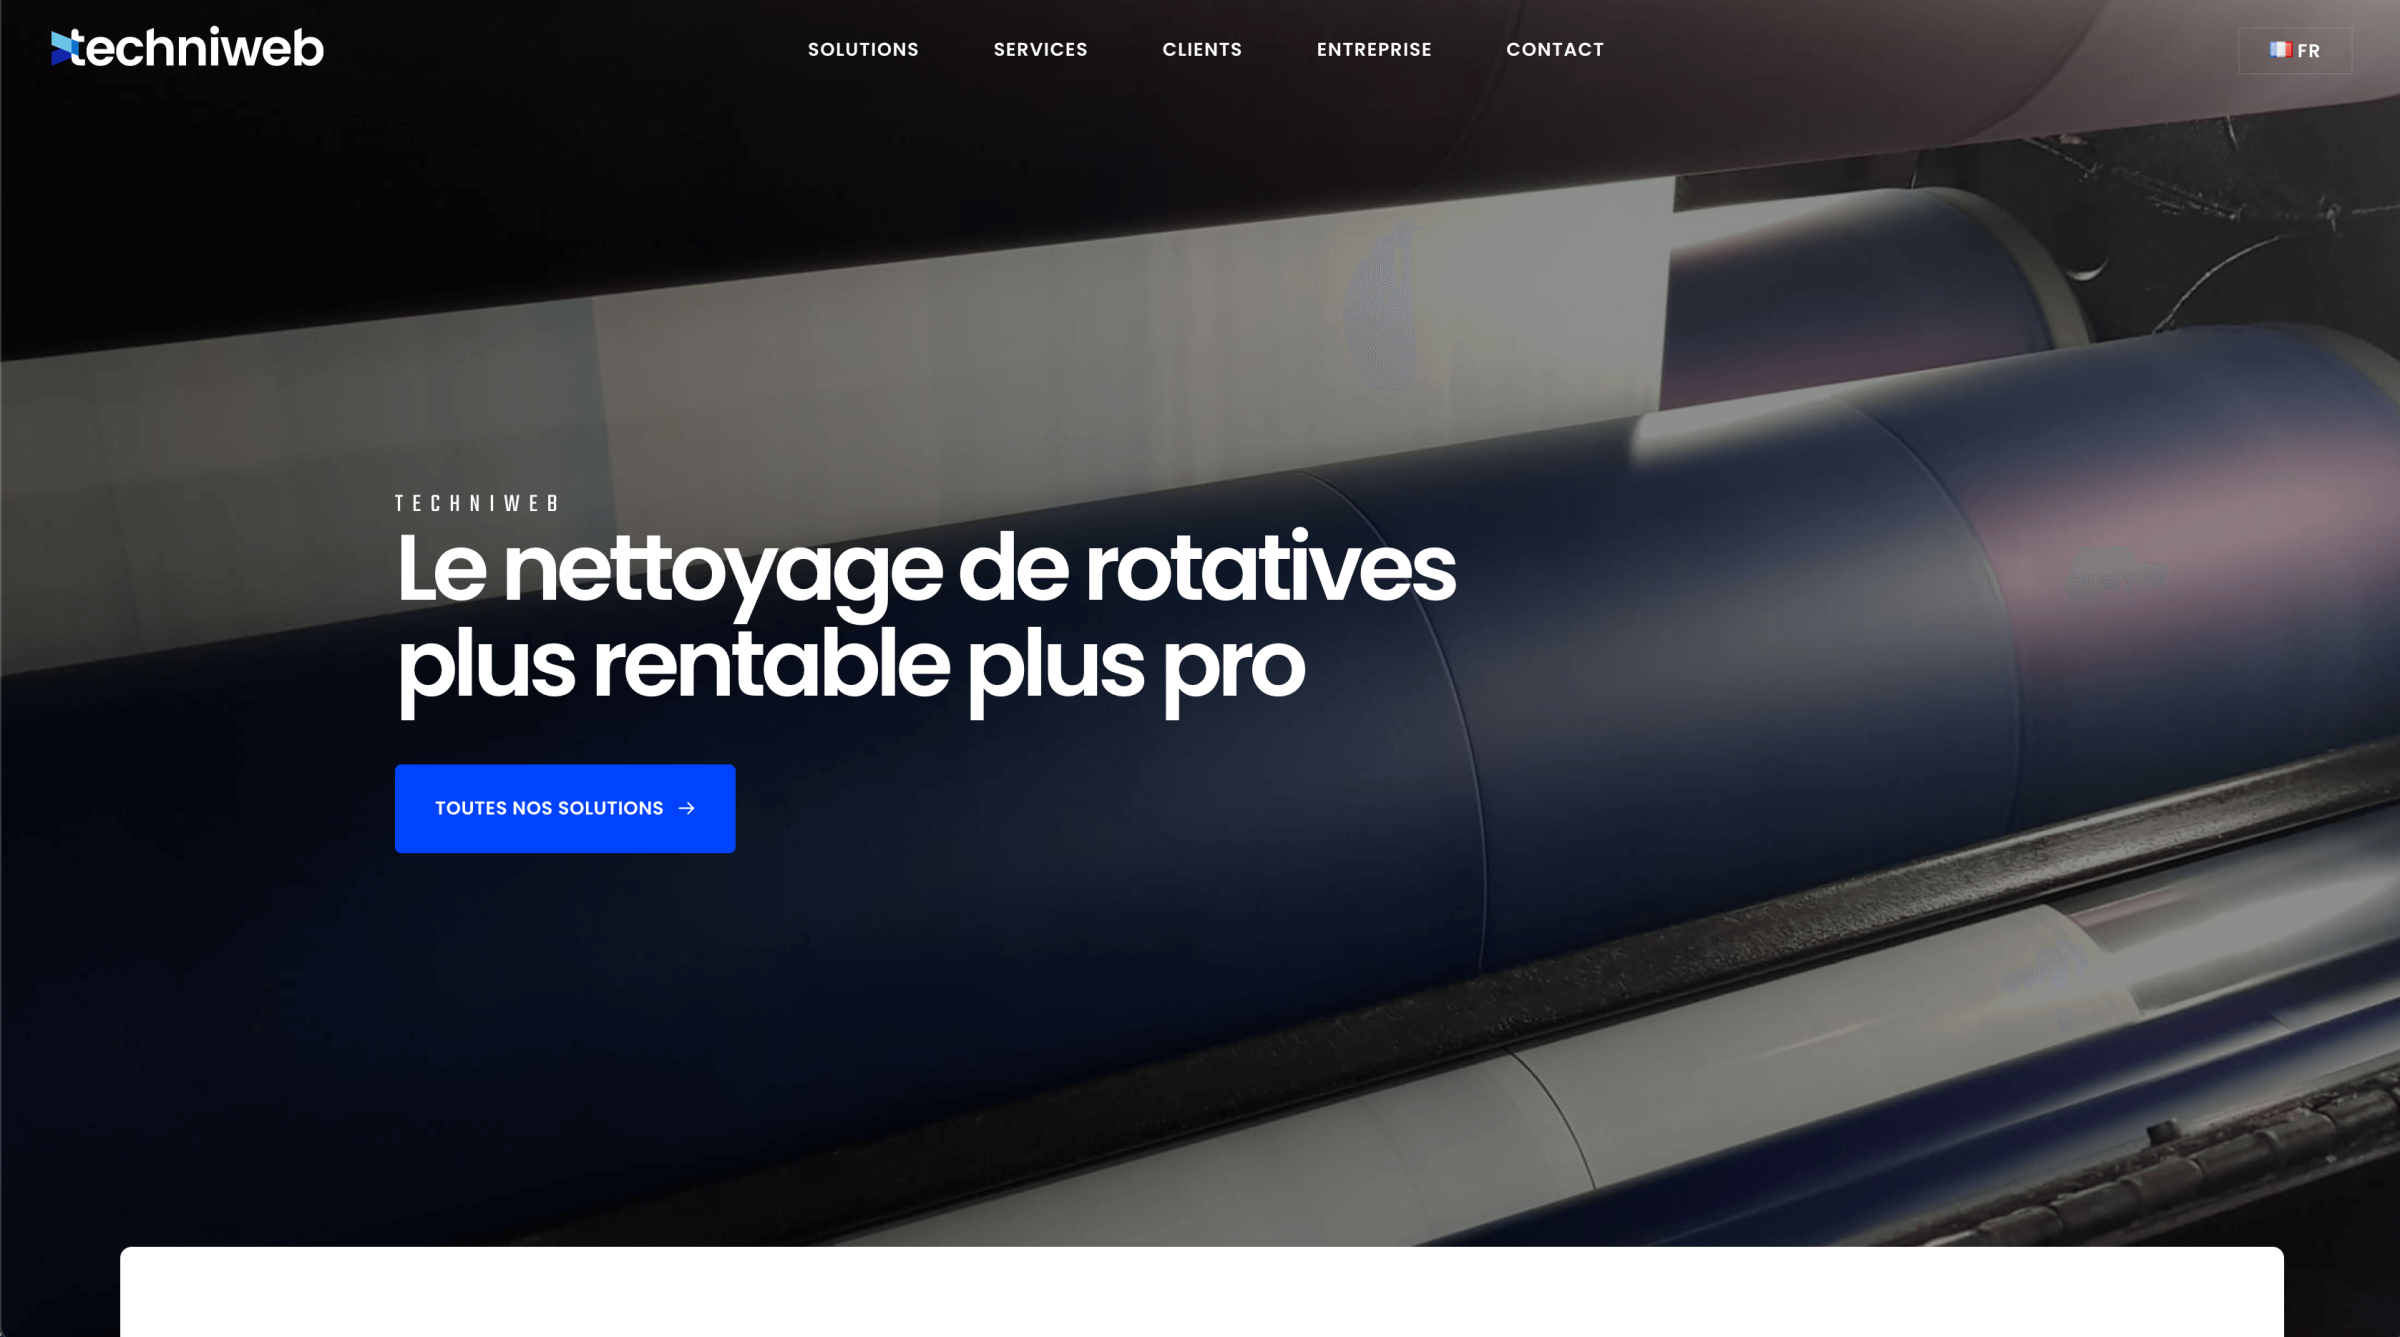 techniweb-website-screenshot